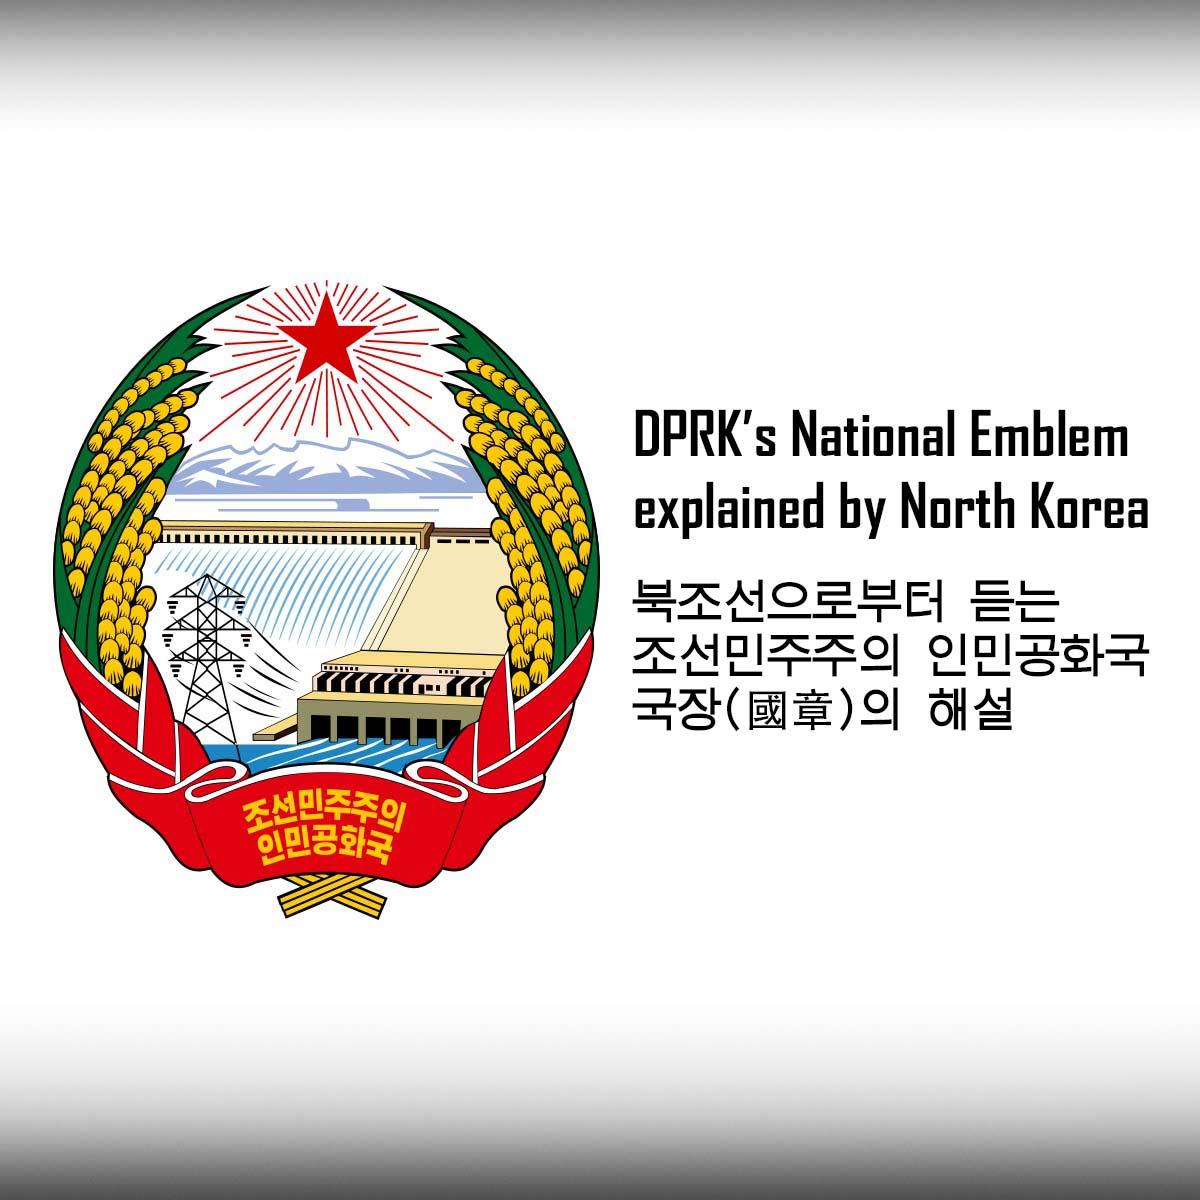 DPRK's National Emblem Explained by North Korea 북조선으로부터 듣는 조선민주주의 인민공화국 국장(國章)의 해설